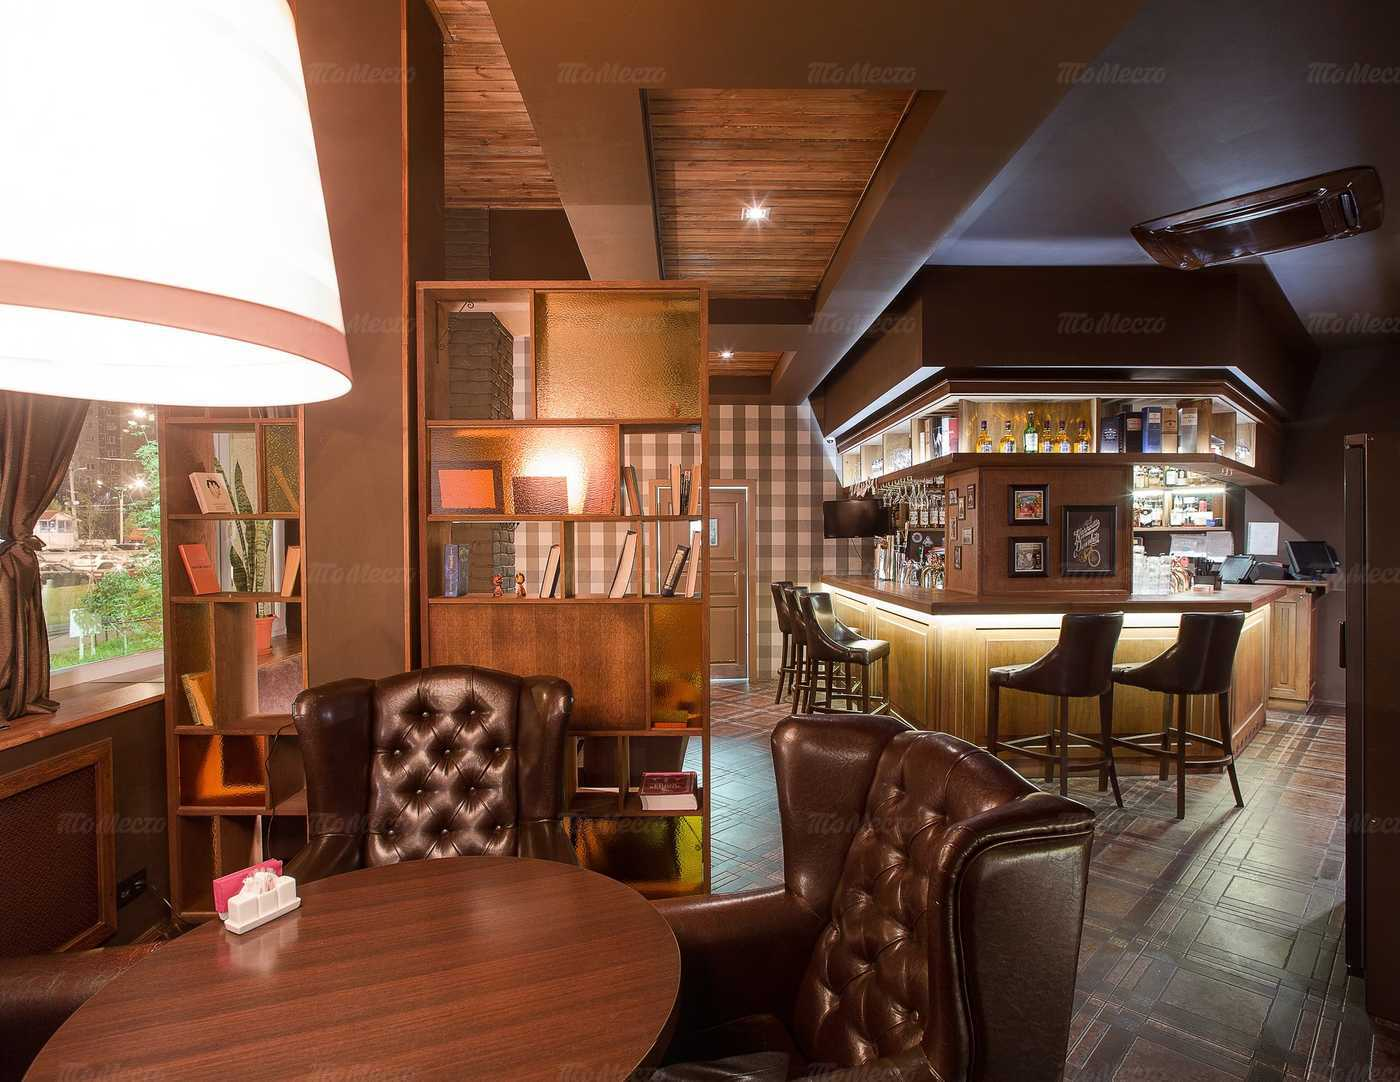 Меню паба, пивного ресторана, ресторана Мюнхель (Munhell) на Богатырском проспекте